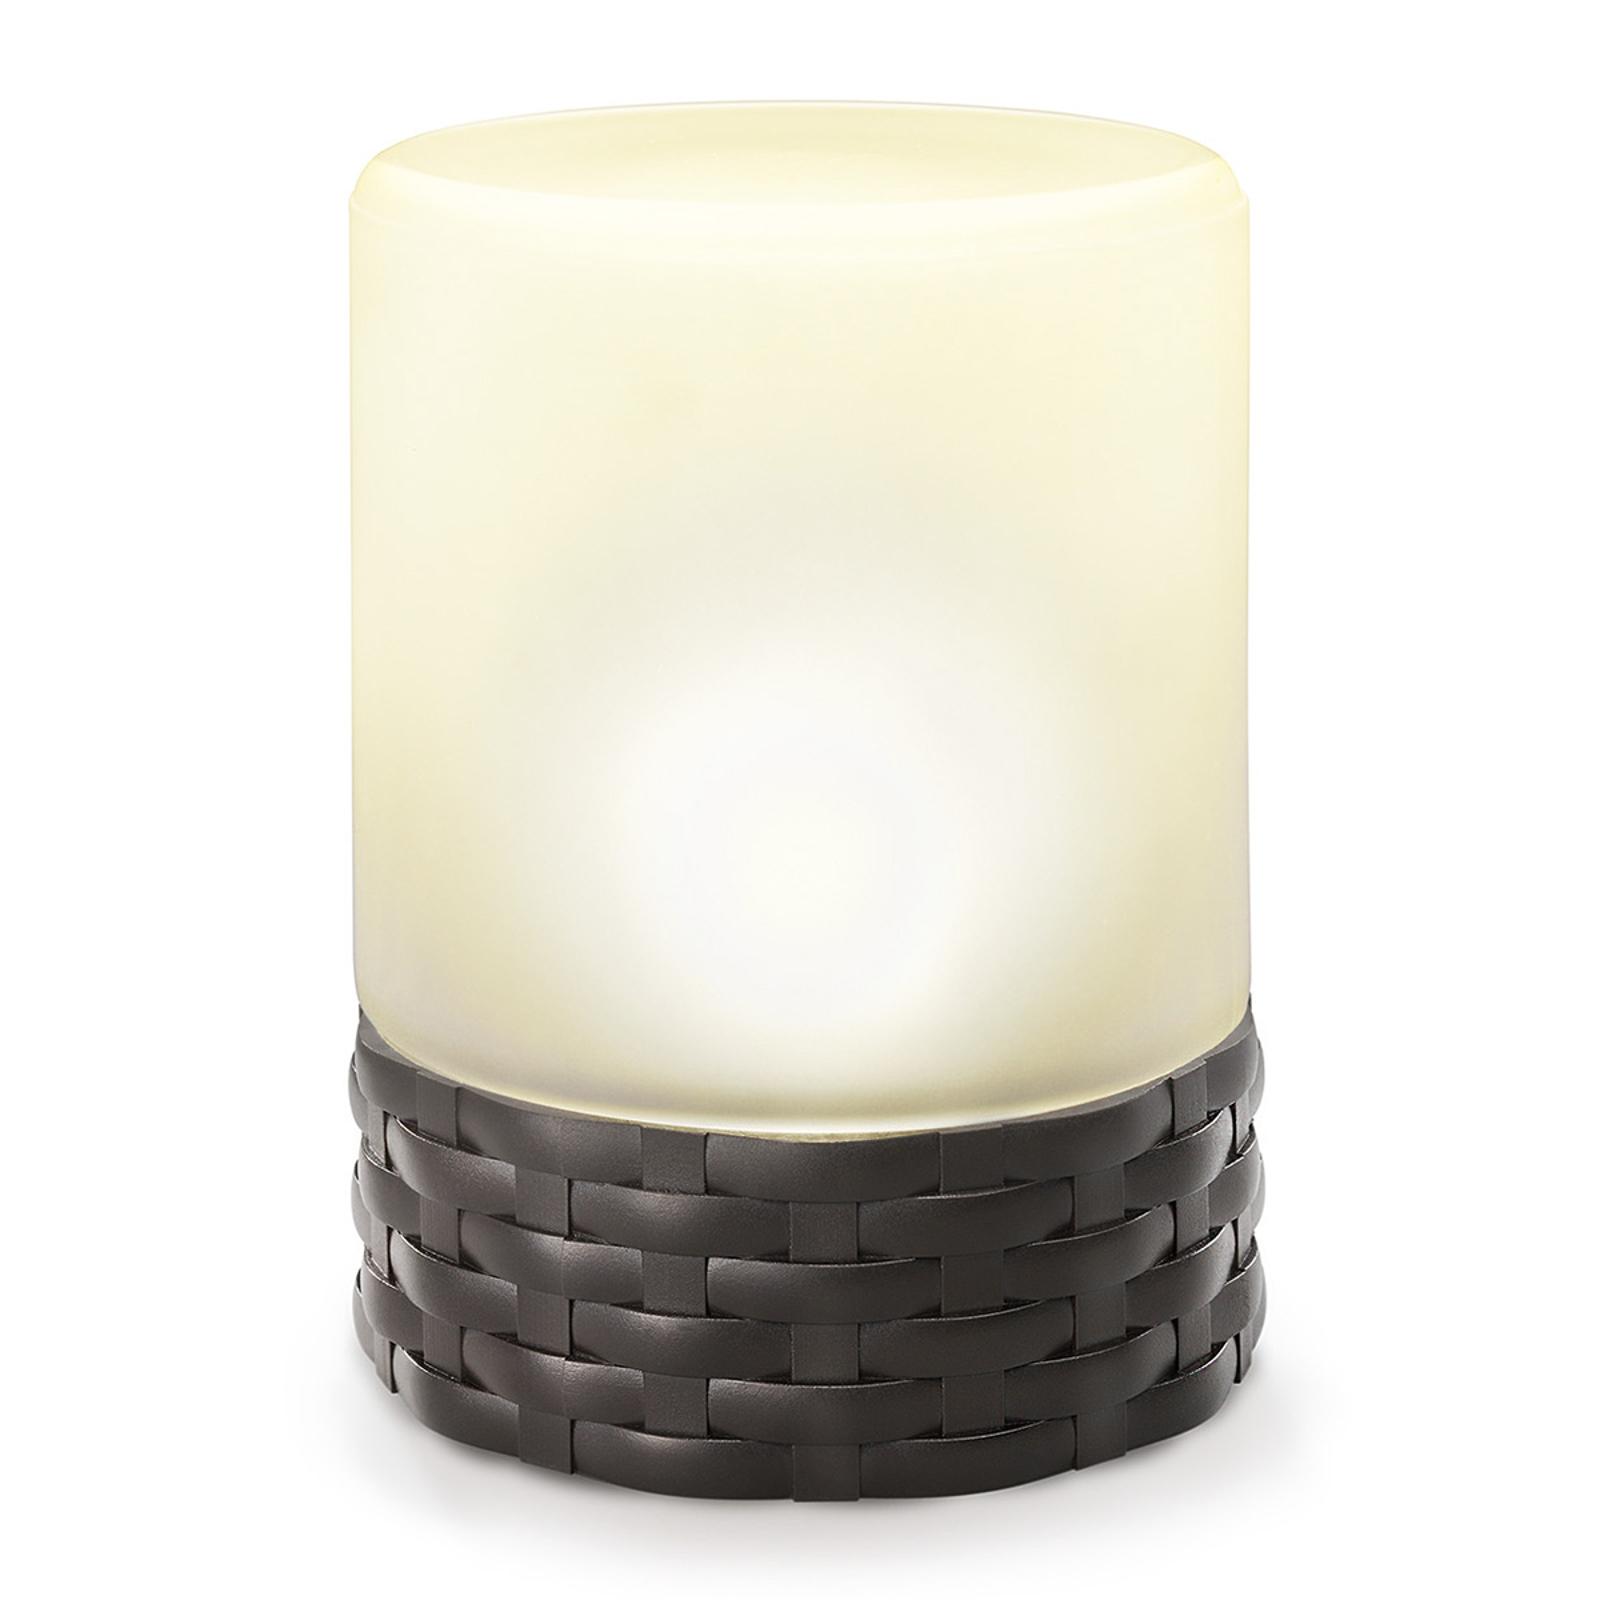 Cloe - lampada solare LED in stile rattan